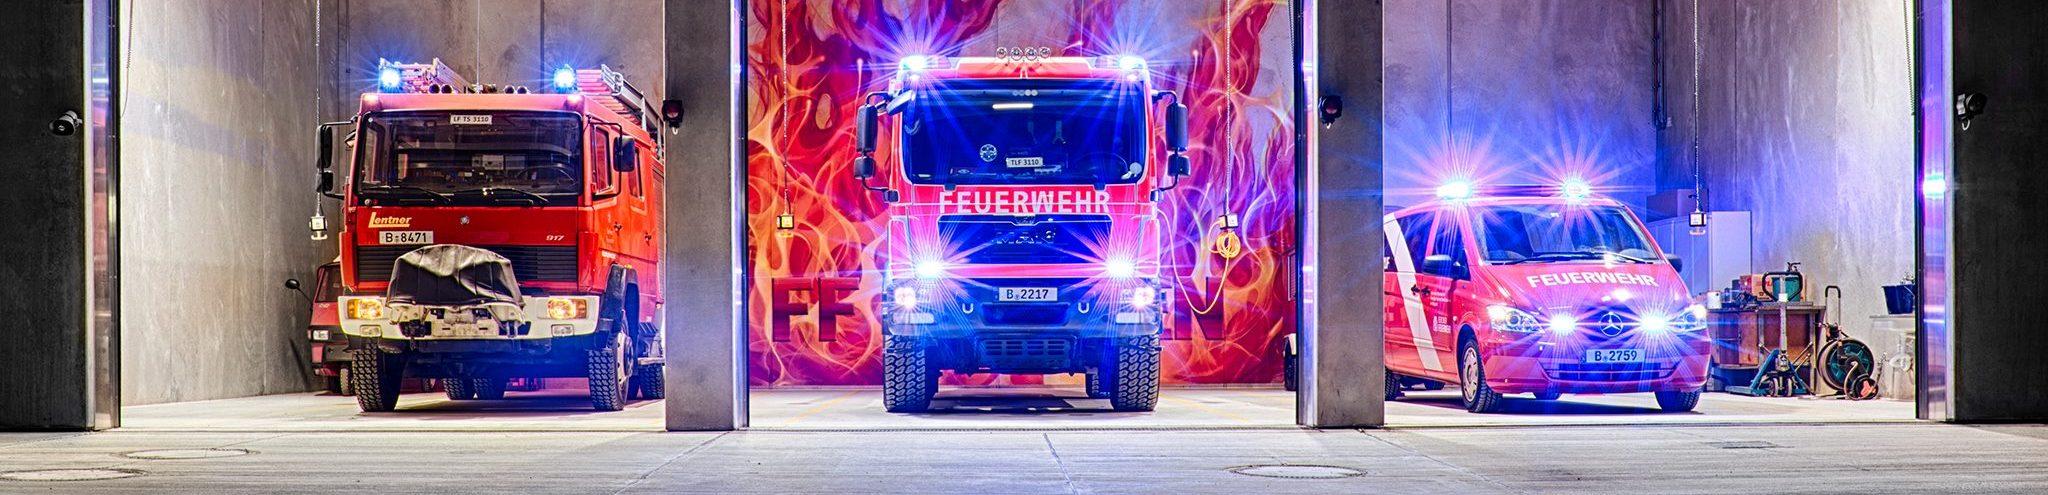 FF Staaken (3110)